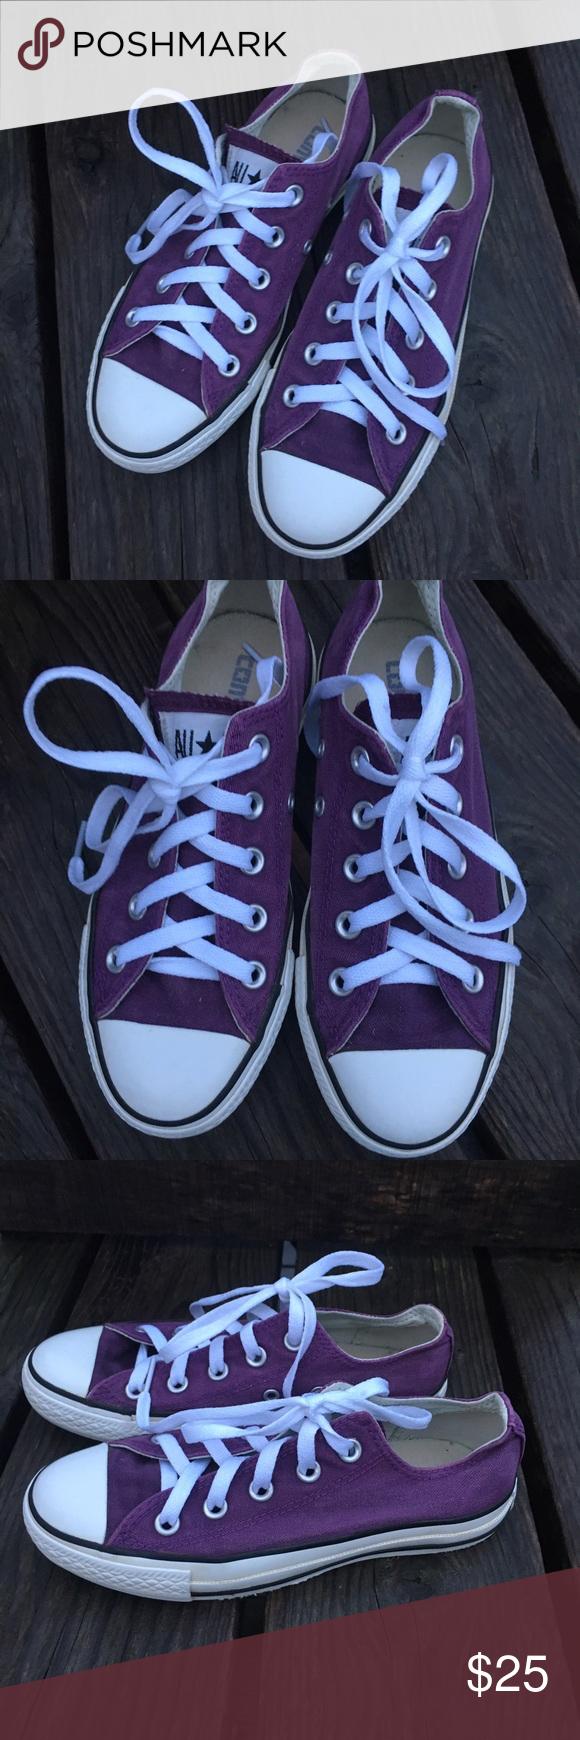 173abaa1b5e 🆕List! Purple Converse All-Stars! New Laces! GUC! Men s   kids size ...